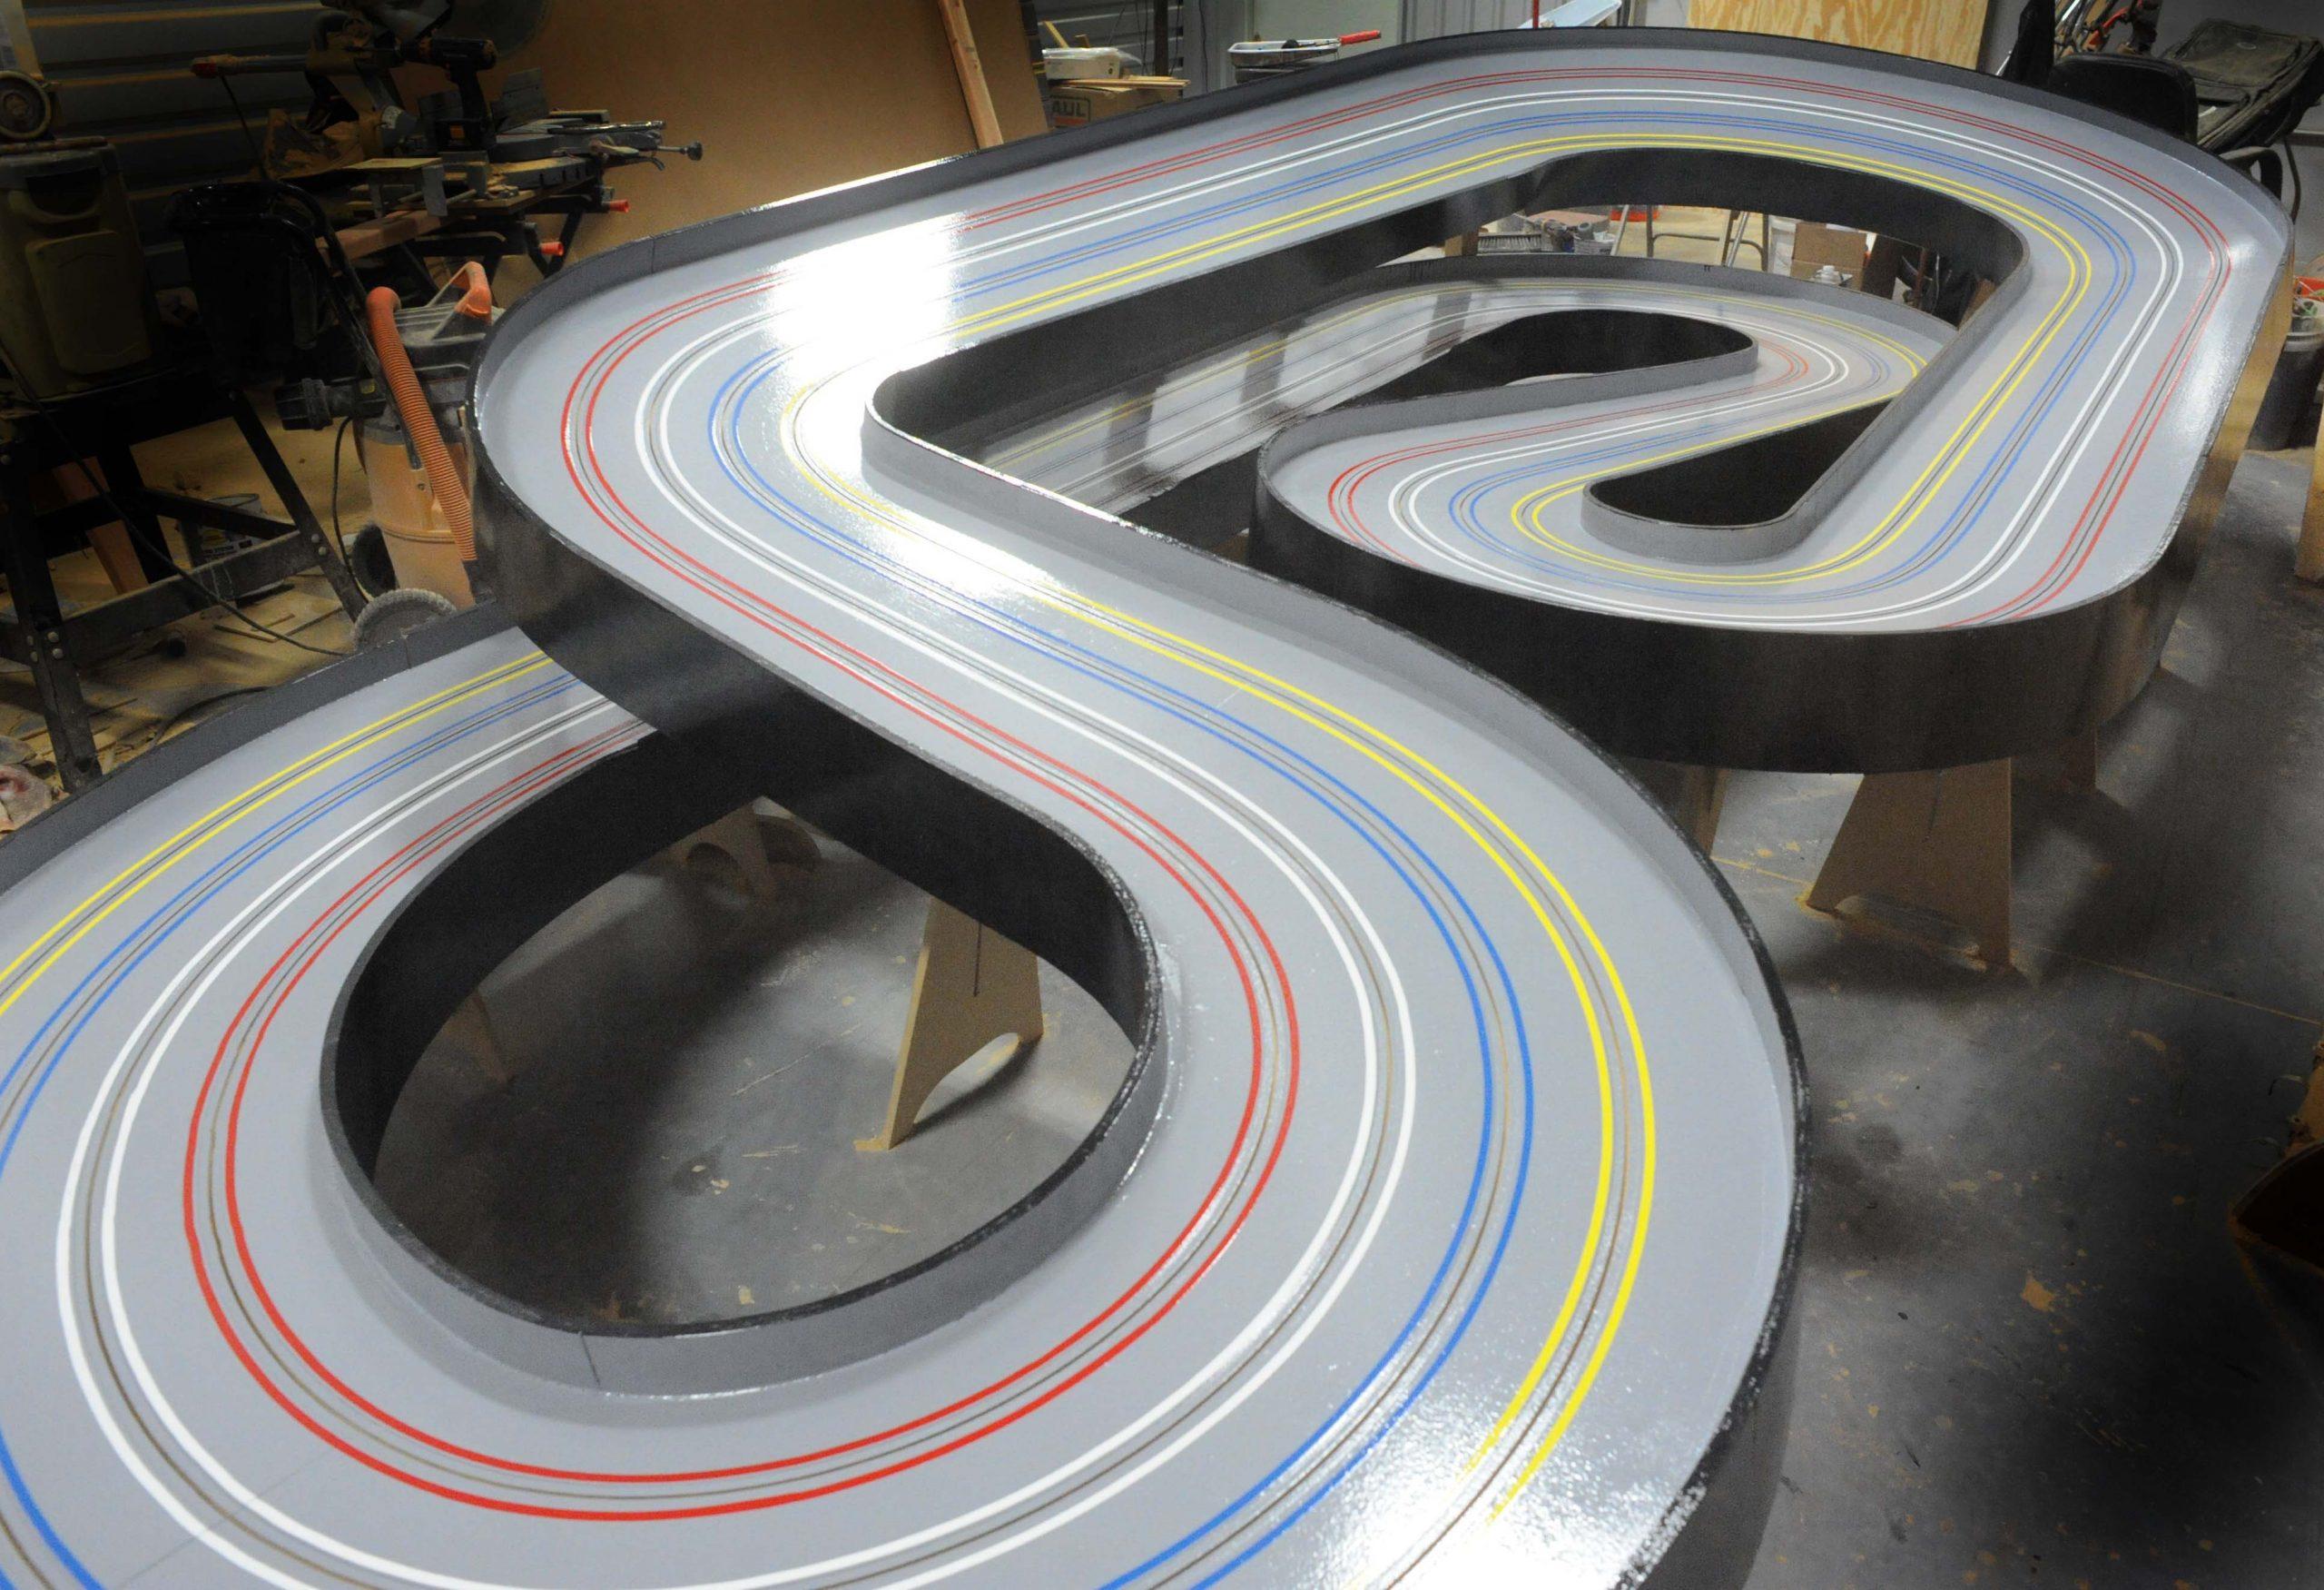 4 lane home slot car track